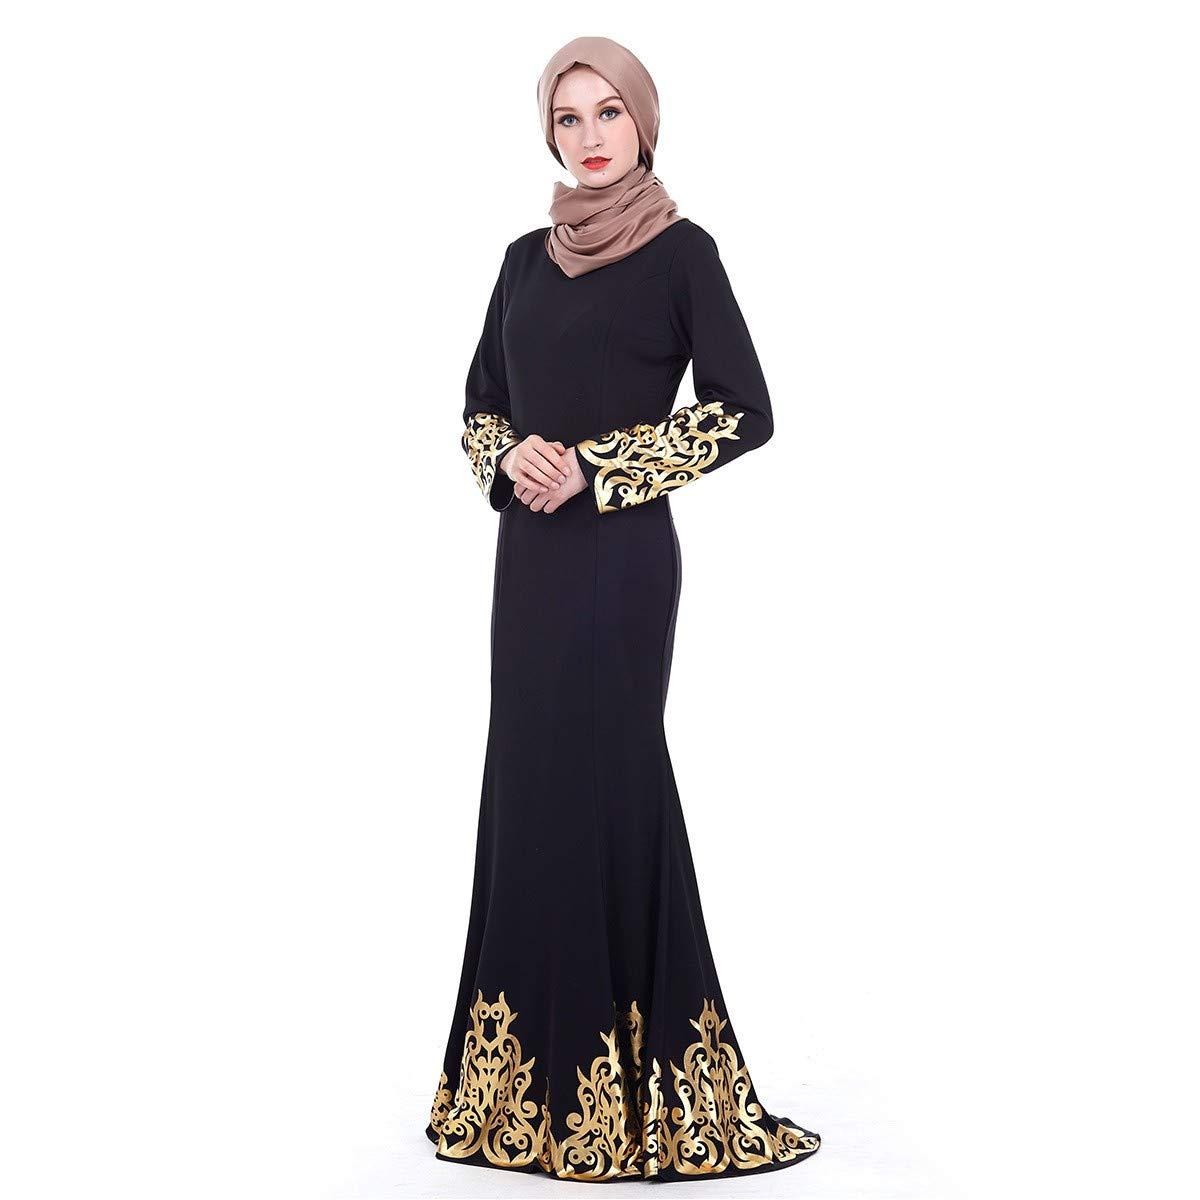 RISTHY Vestido Abaya Musulmana Vestidos Bordado Mujeres Largos Musulmán Maxi Vestidos Dubai Turquia Islámica Árabe Kaftan Dubai Batas para Las Mujeres ...